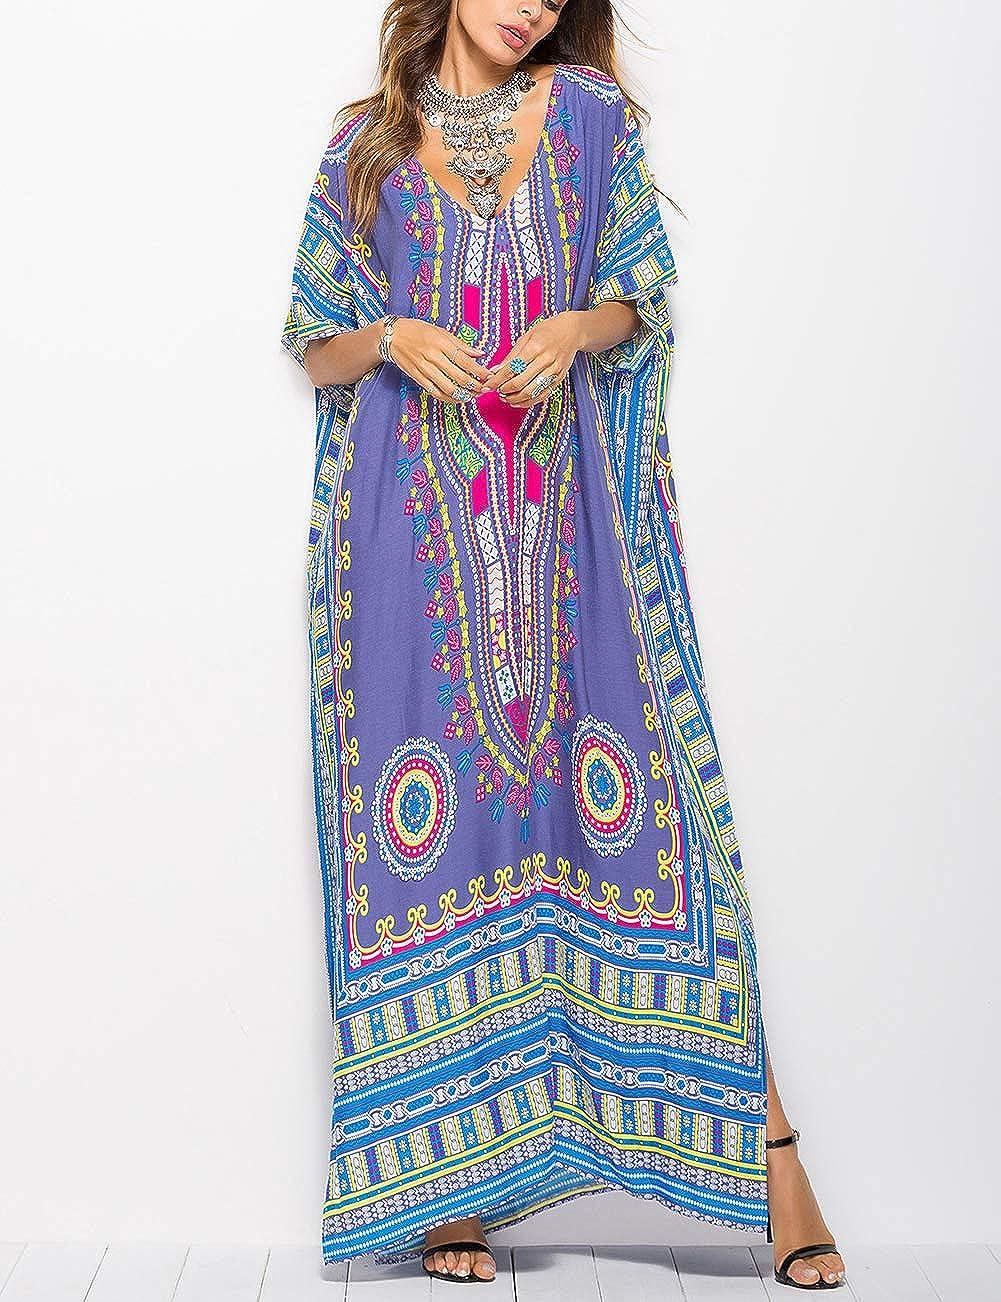 70s Dresses – Disco Dress, Hippie Dress, Wrap Dress Bsubseach Women Bathing Suits Cover Up Ethnic Print Kaftan Beach Maxi Dress $19.99 AT vintagedancer.com